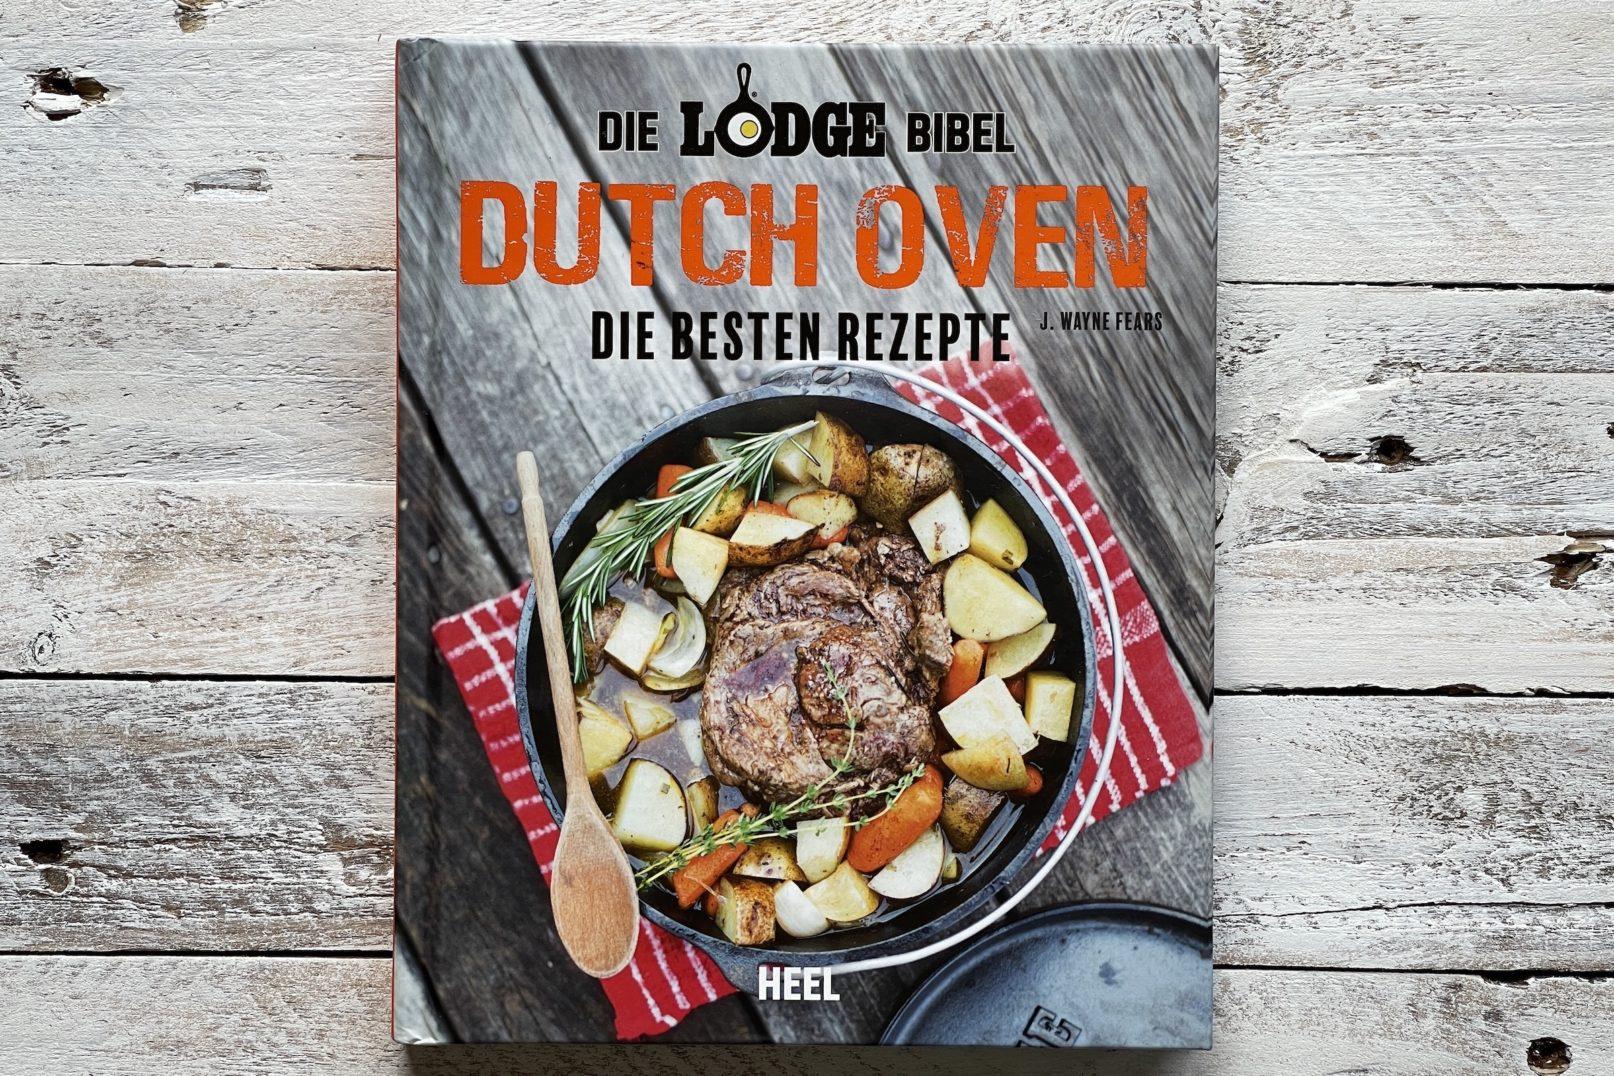 Buch Lodge Bibel - Dutch Oven die besten Rezepte